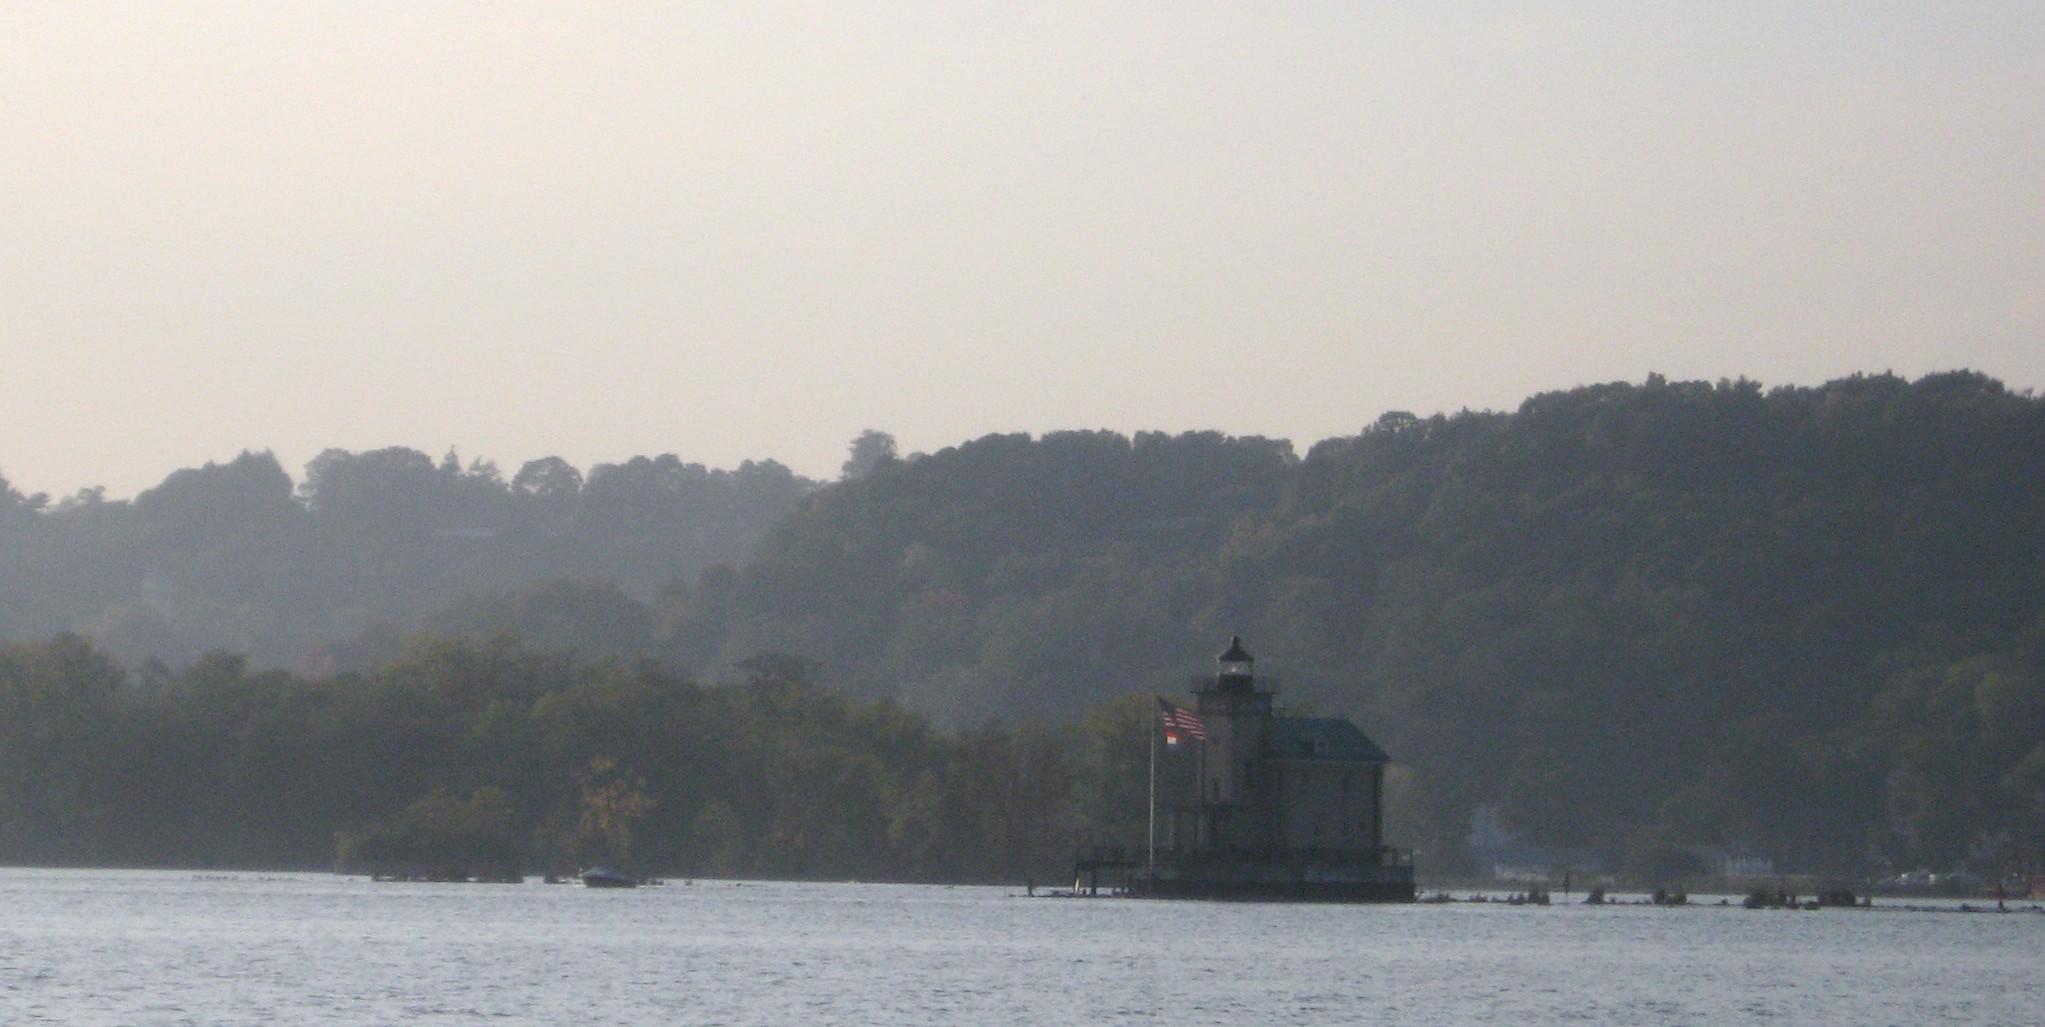 Lighthouse on the Hudson River